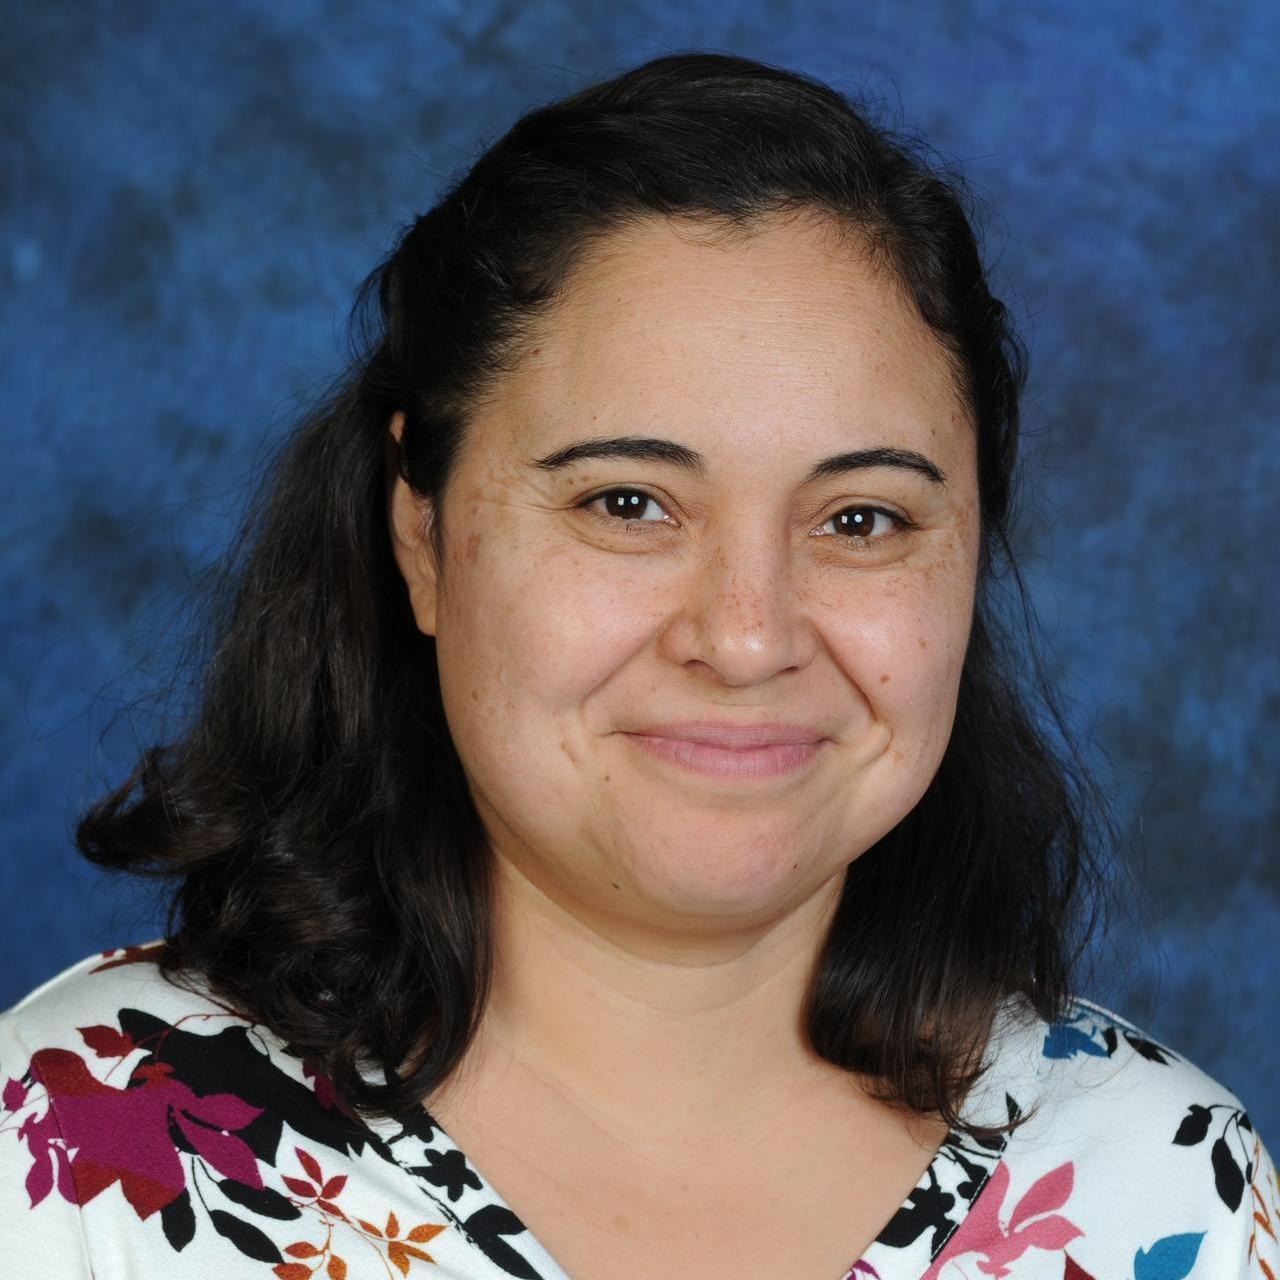 Marthangelica Pallais Salazar's Profile Photo